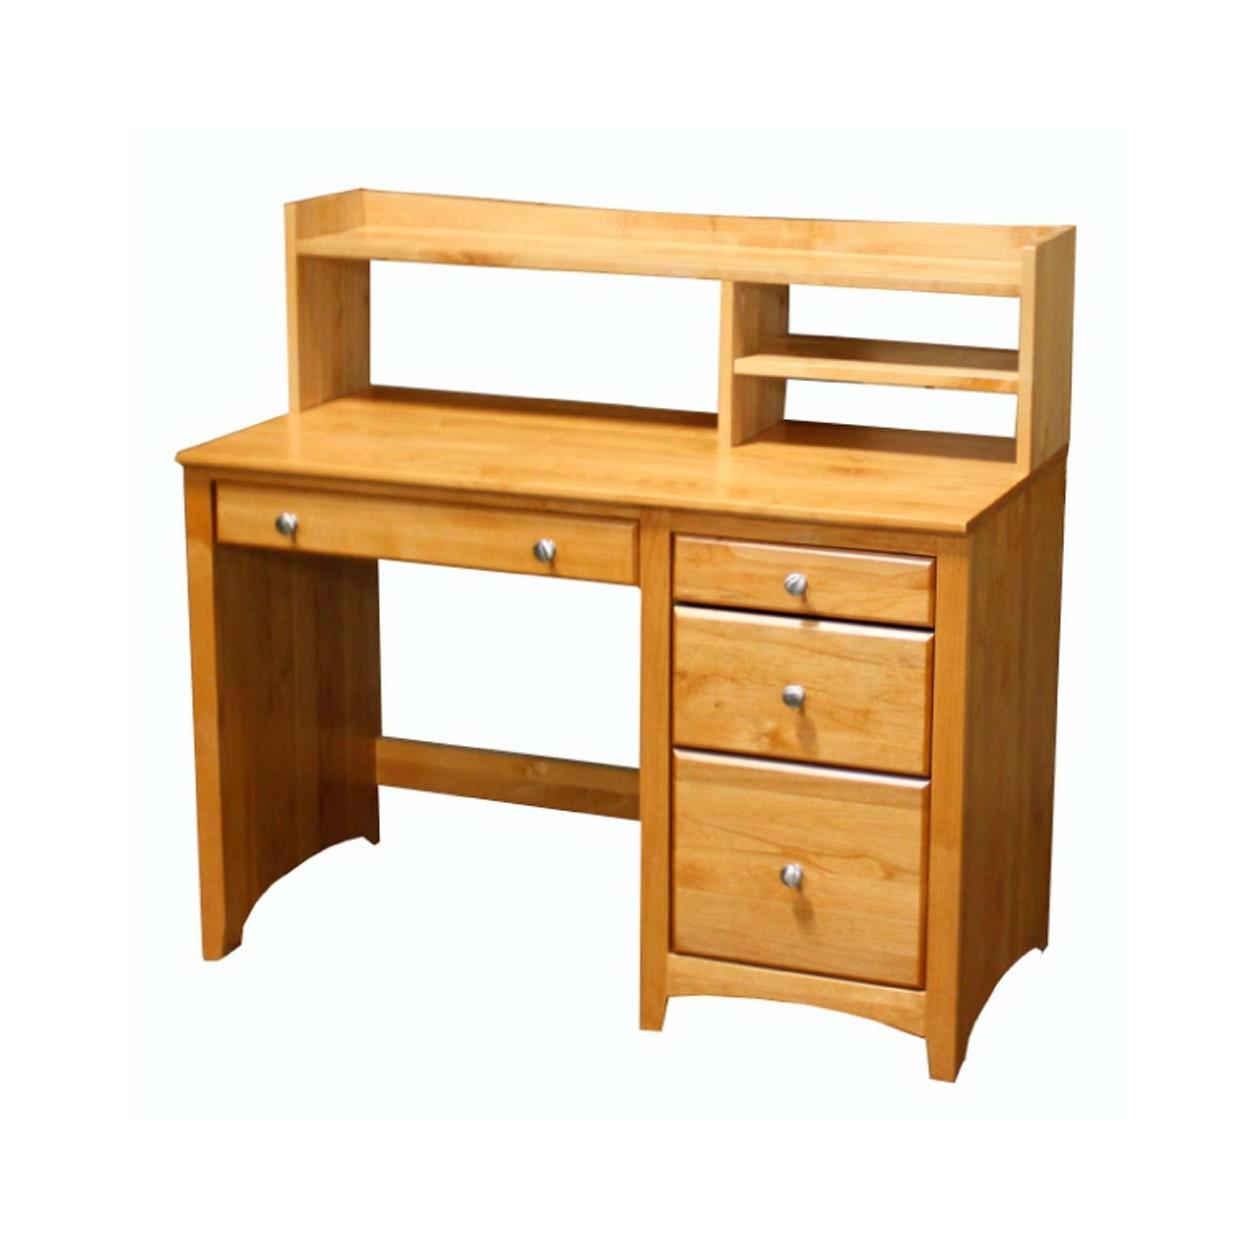 Archbold Shaker Student Desk    Starting at: $799.99